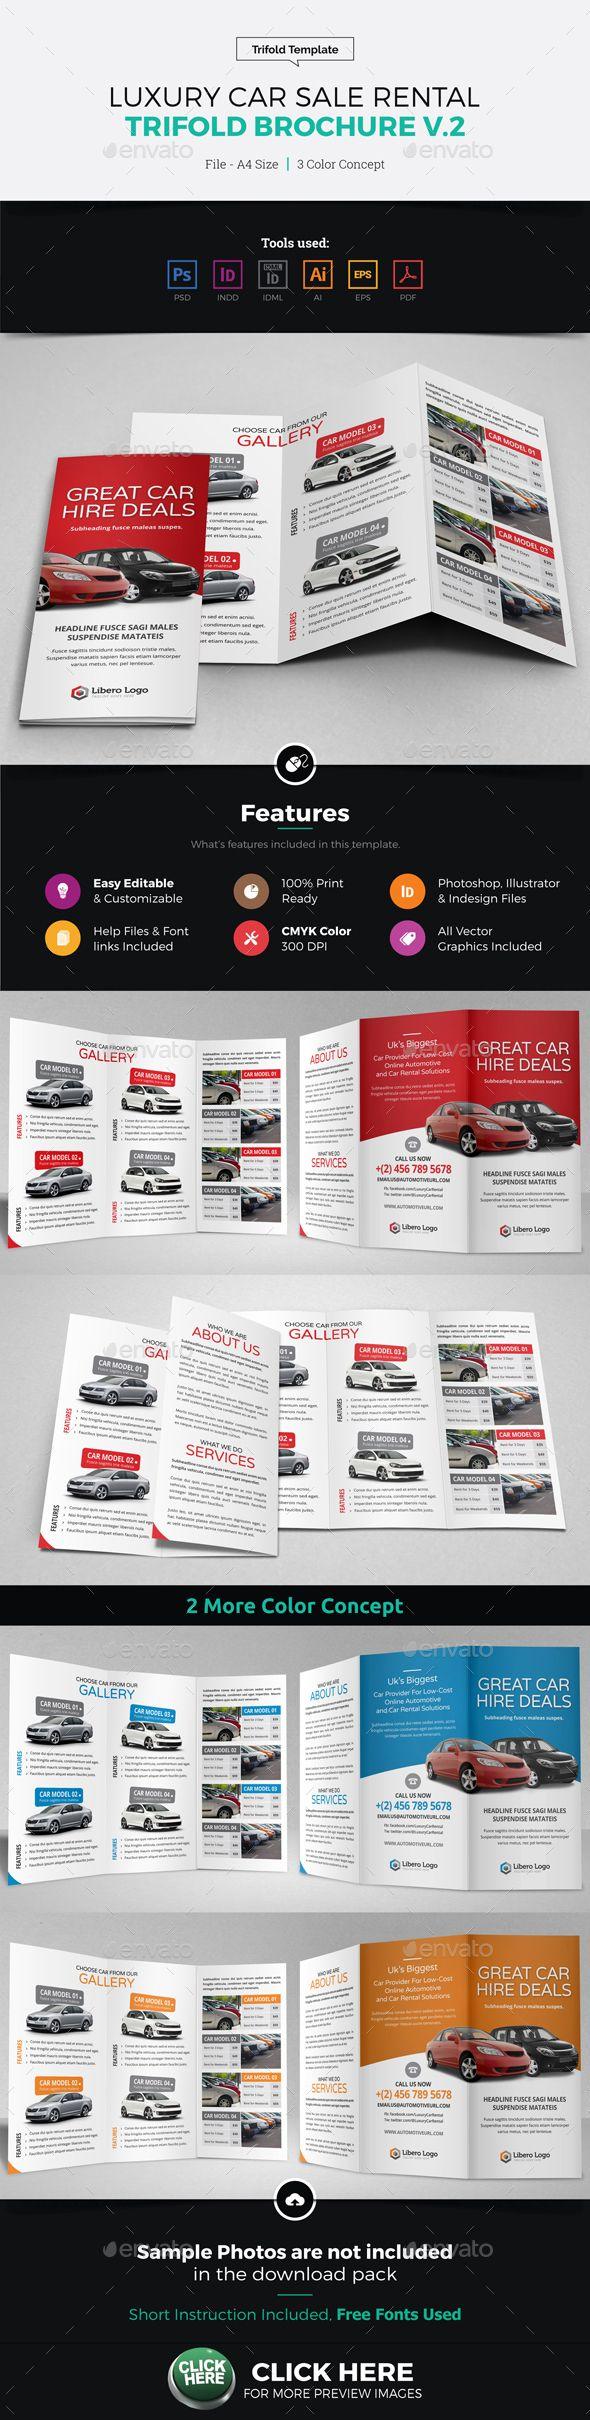 Luxury Car Sale Rental Trifold Brochure V  Brochures Corporate